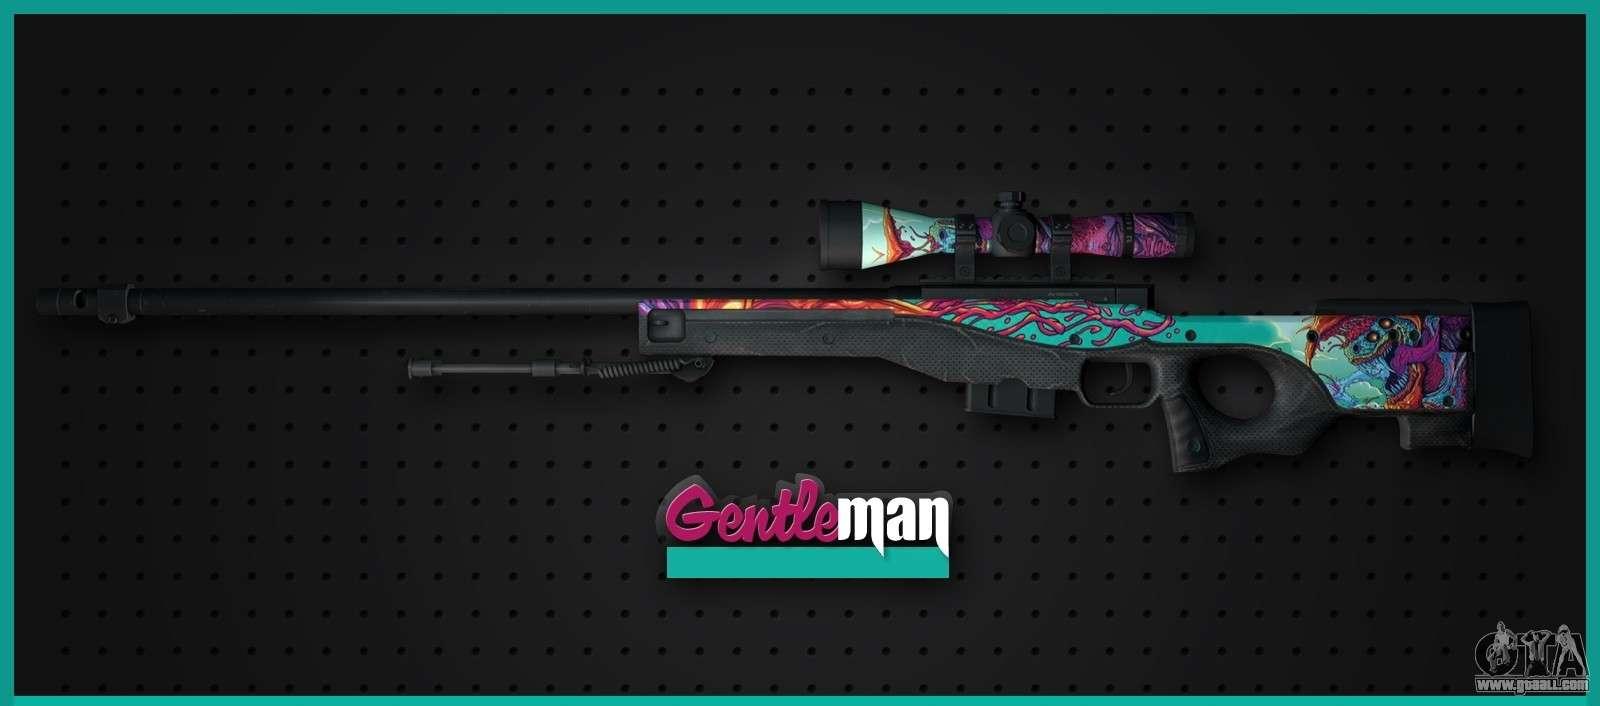 Hd wallpaper eagle - Awp From Cs Go Gentleman For Gta San Andreas